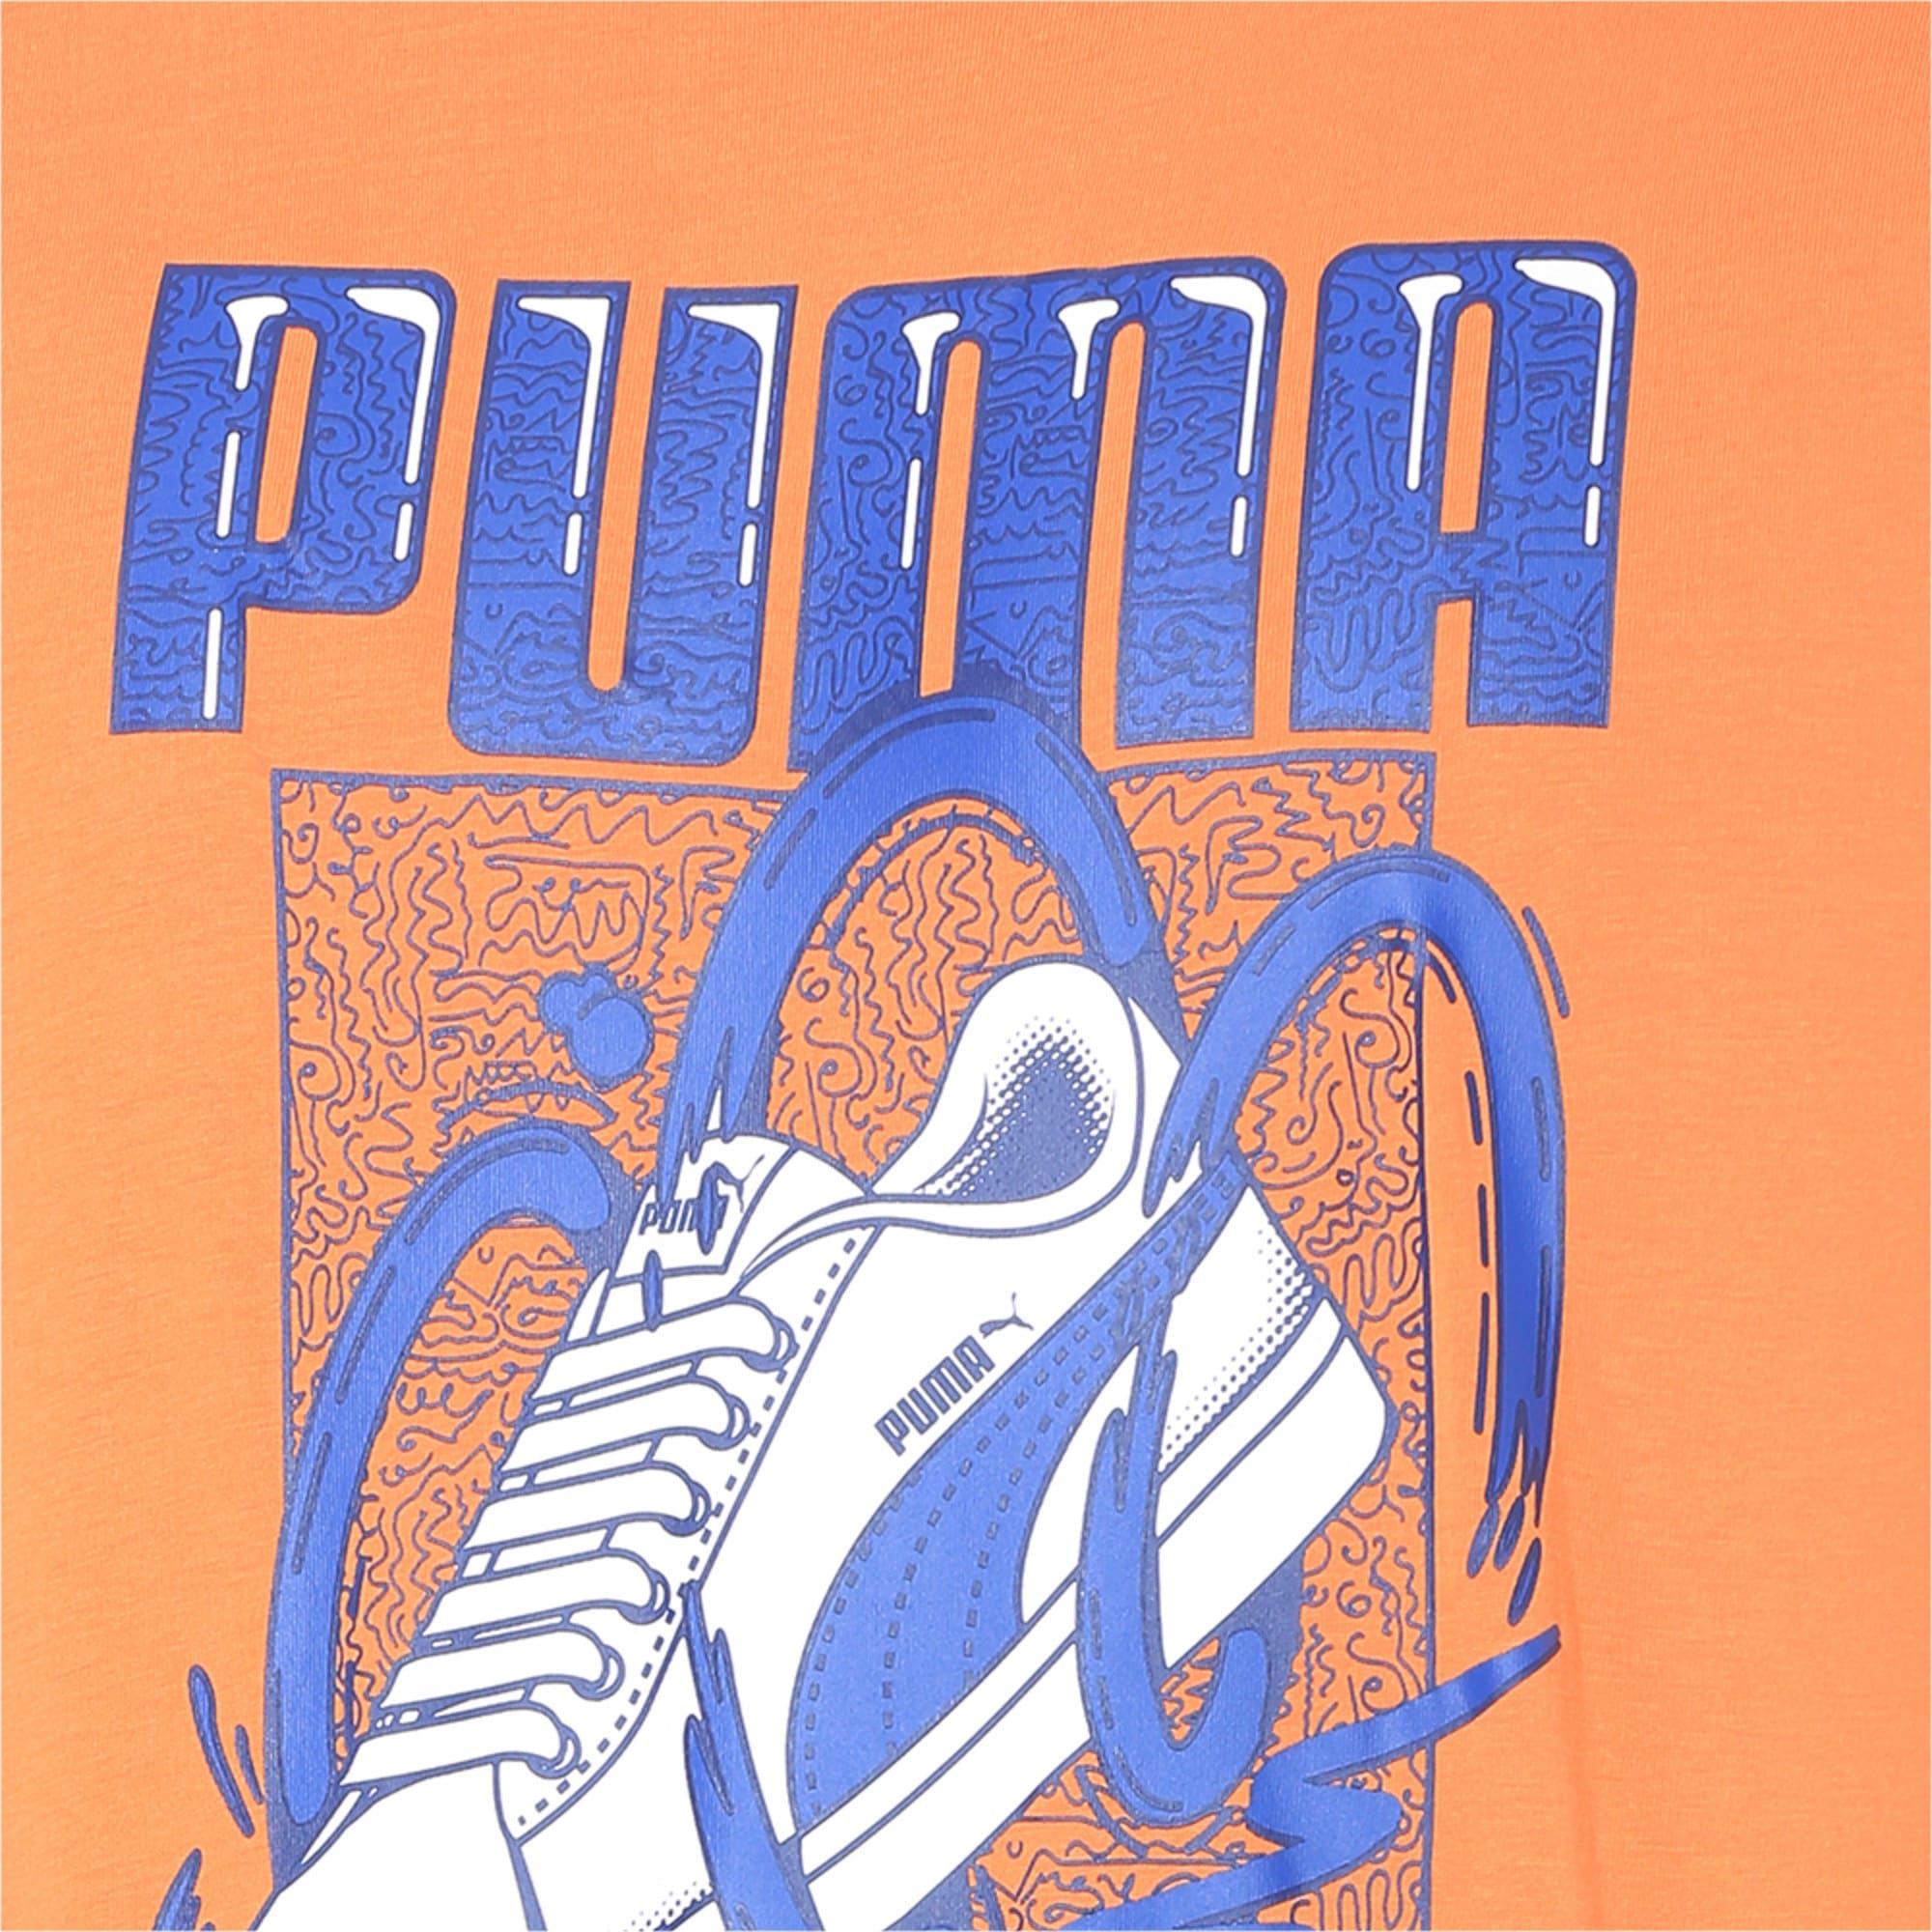 Thumbnail 6 of Sneaker Graphic Men's Tee, Jaffa Orange, medium-IND